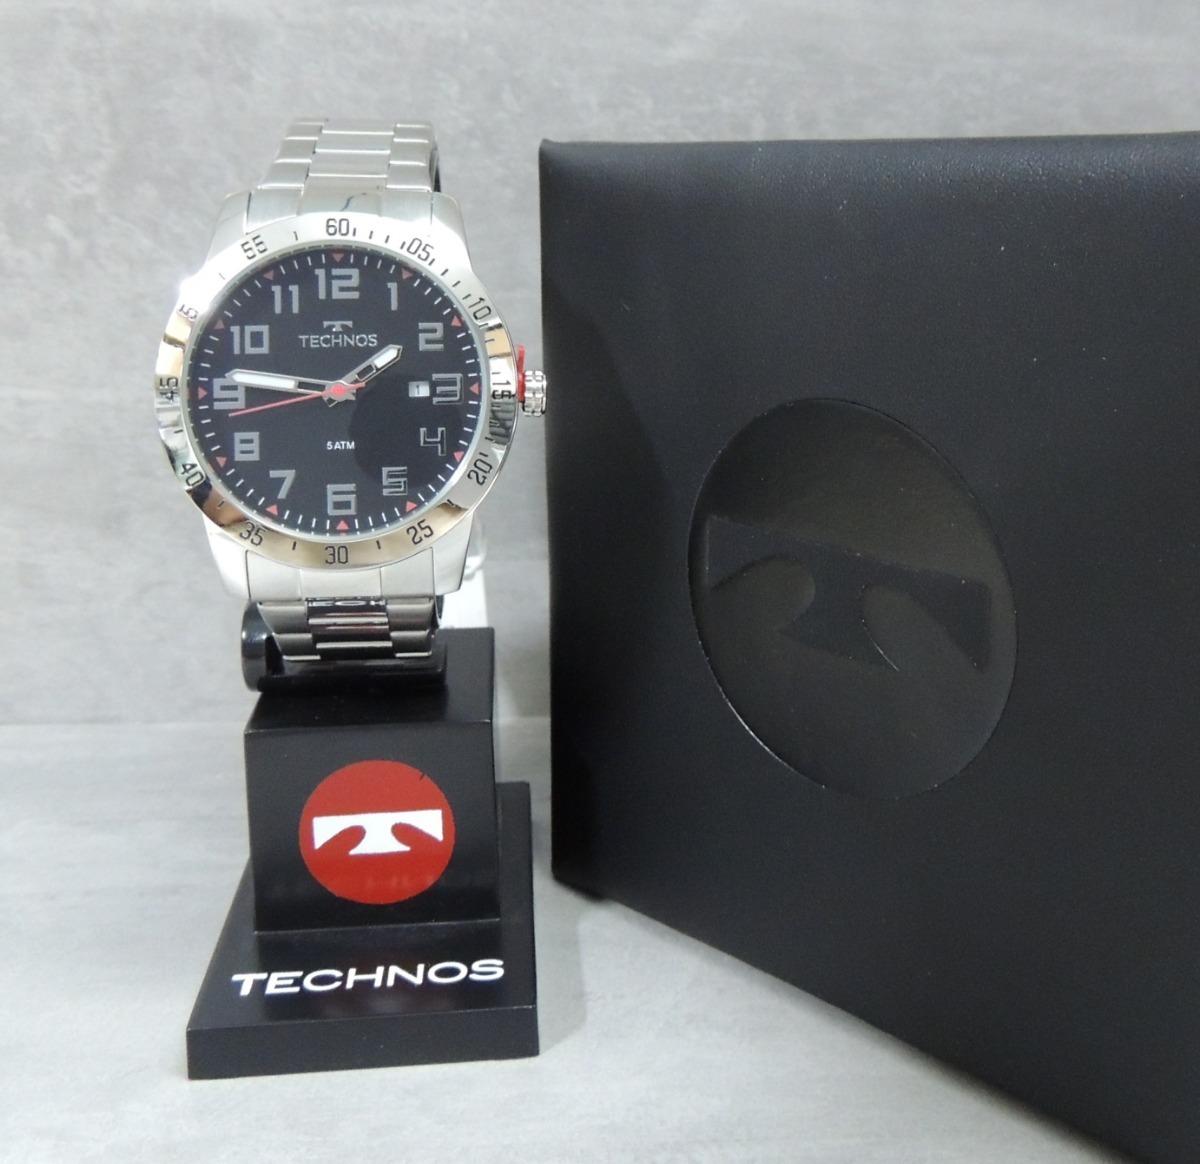 8f22c72e27a relógio technos masculino 2115mli 1p performance military nf. Carregando  zoom.